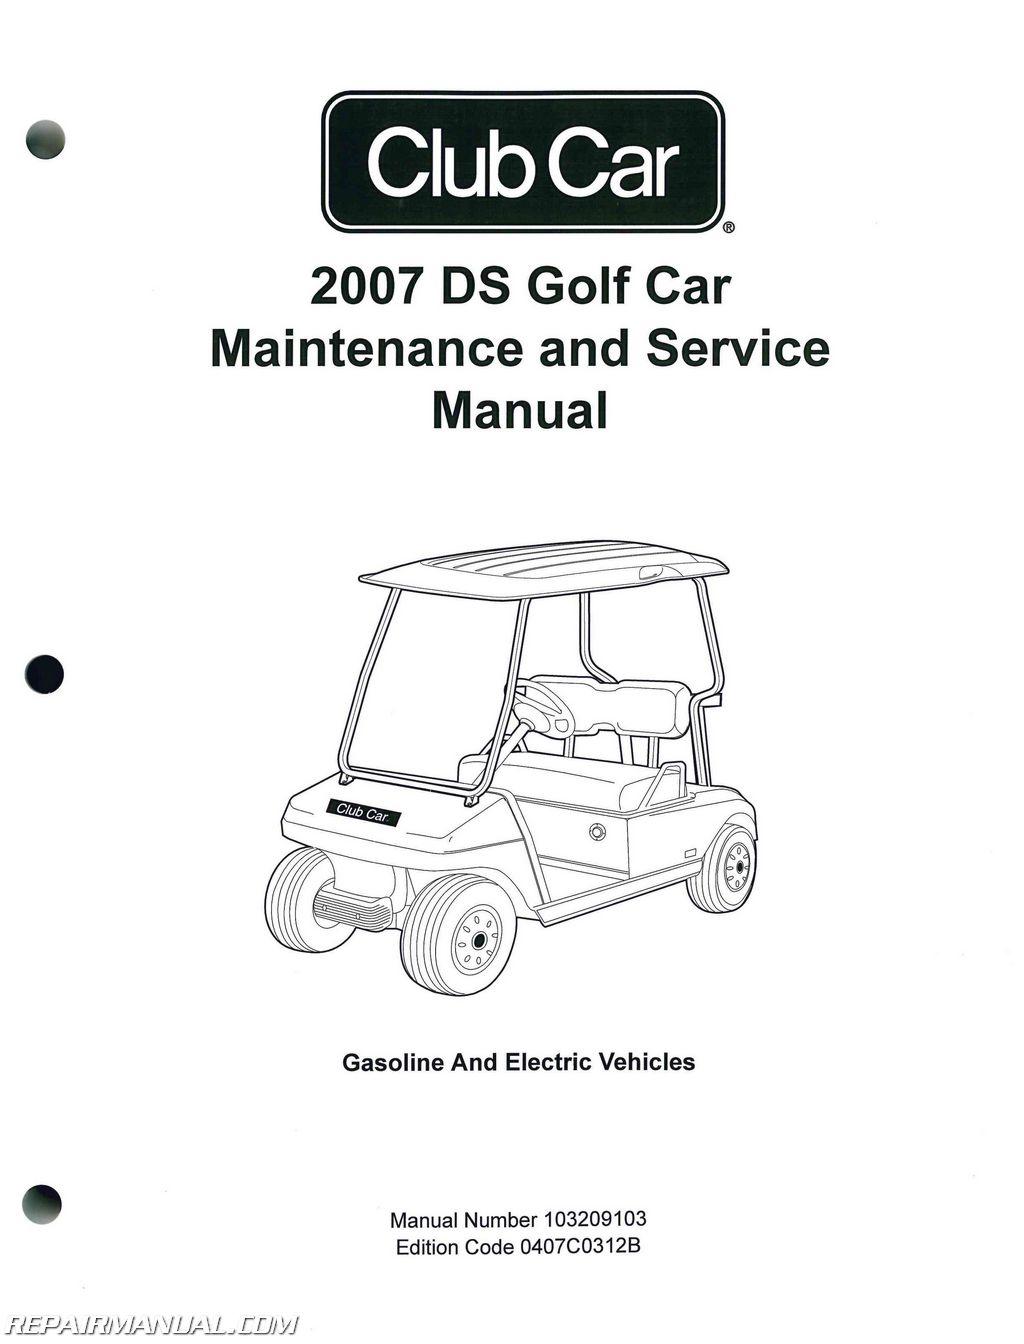 electric golf cart fuses diagrams sk 1381  golf cart 48v battery wiring diagram moreover club car  golf cart 48v battery wiring diagram